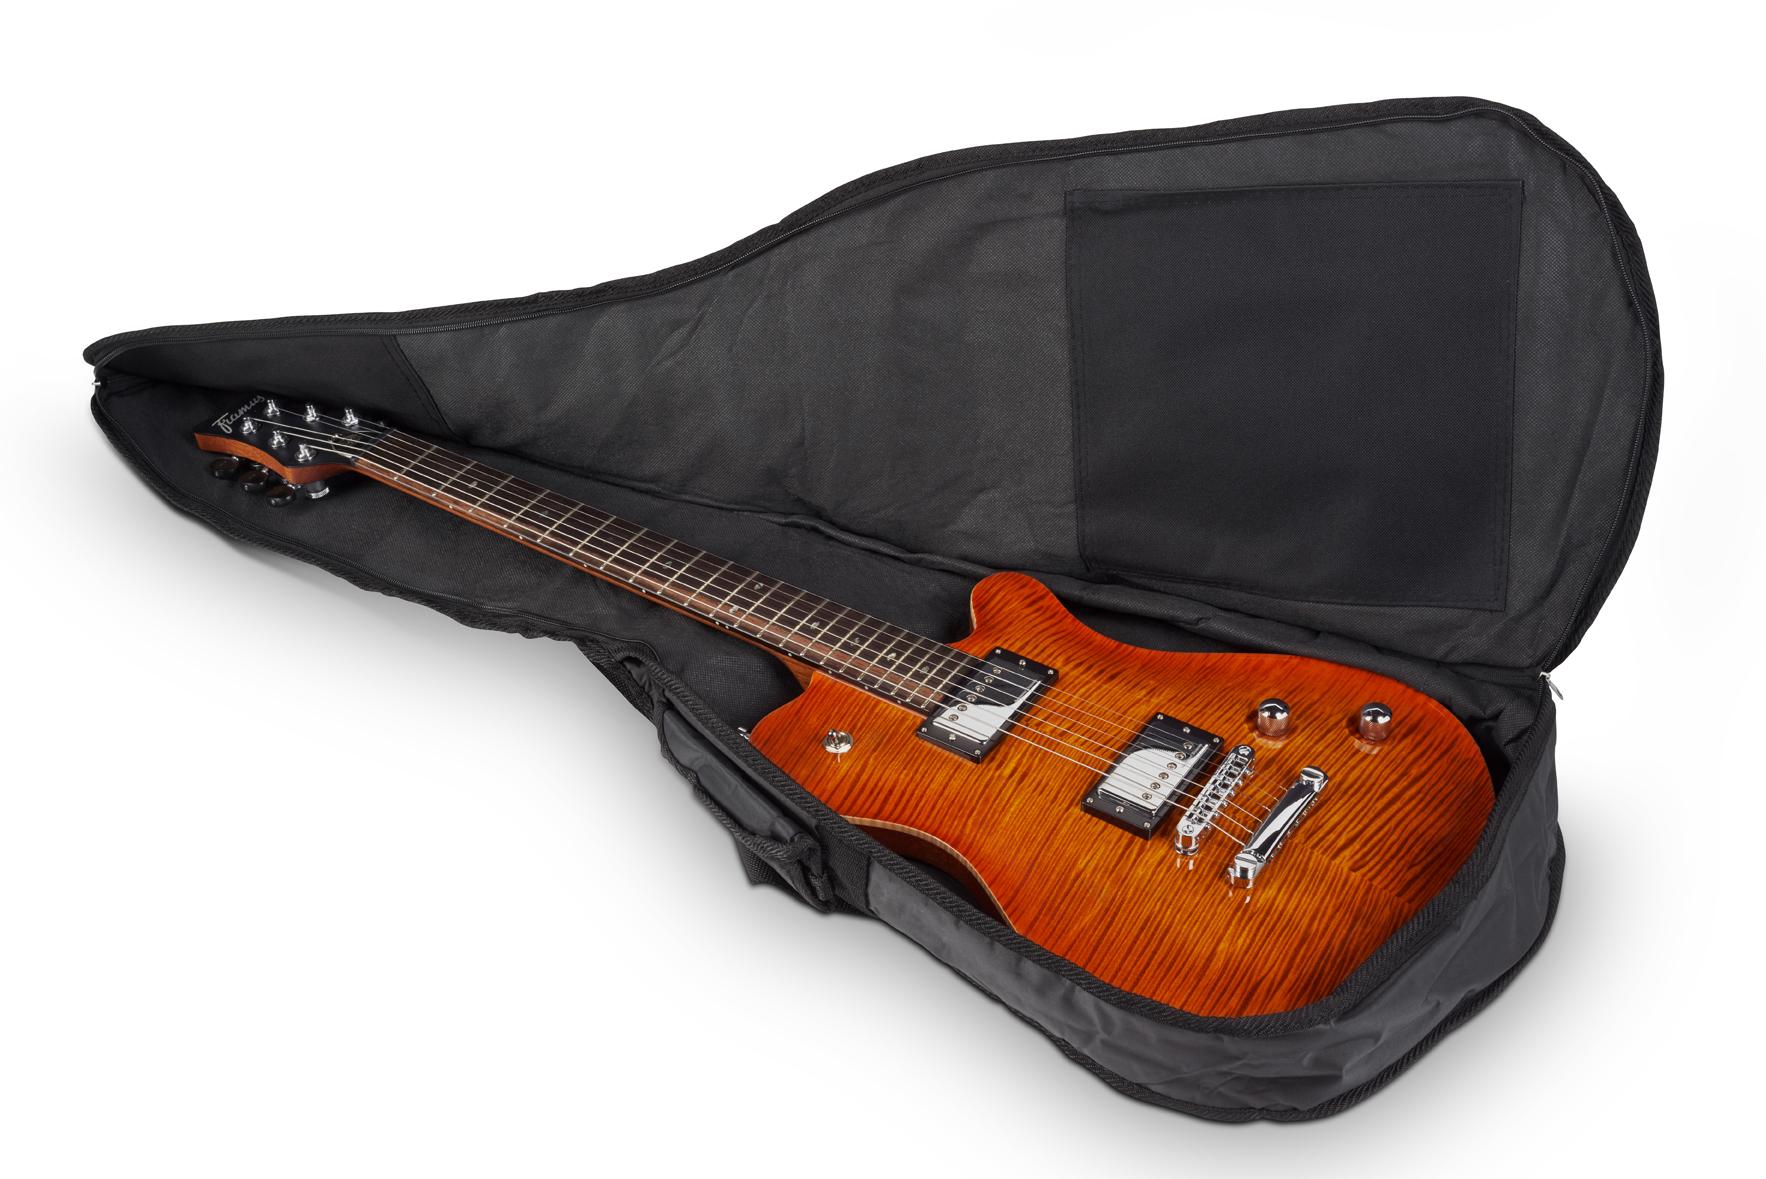 RockBag RB 20526 B - Black Electrical